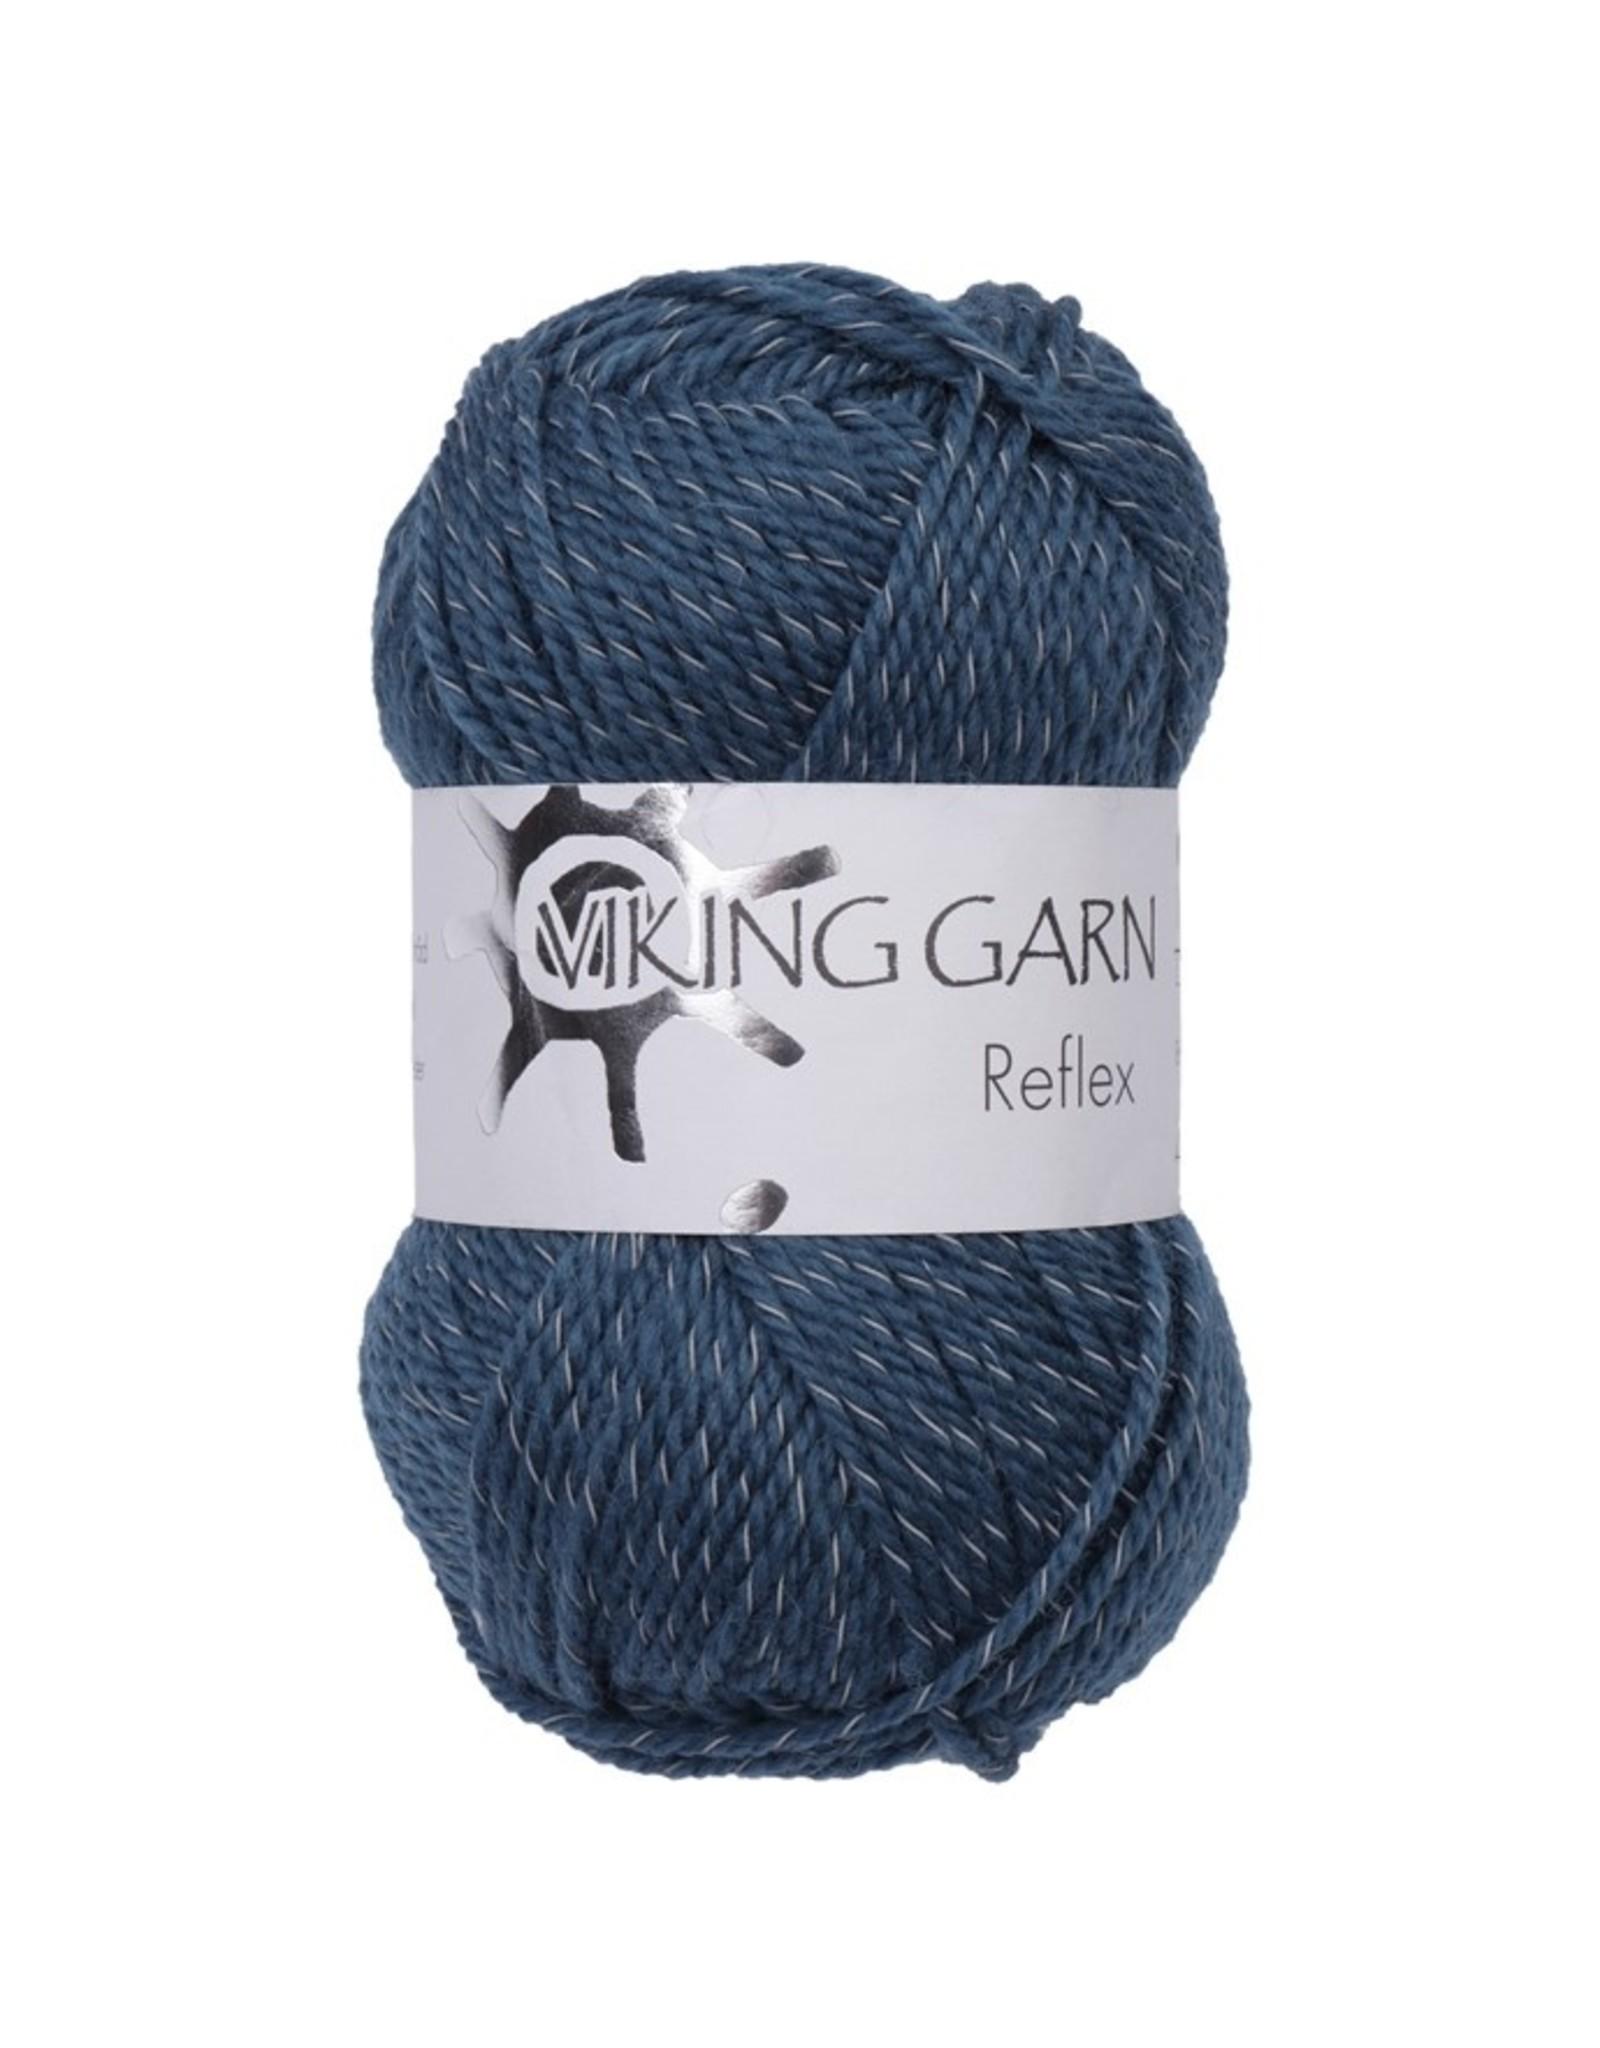 Viking Garn Viking Garn Reflex